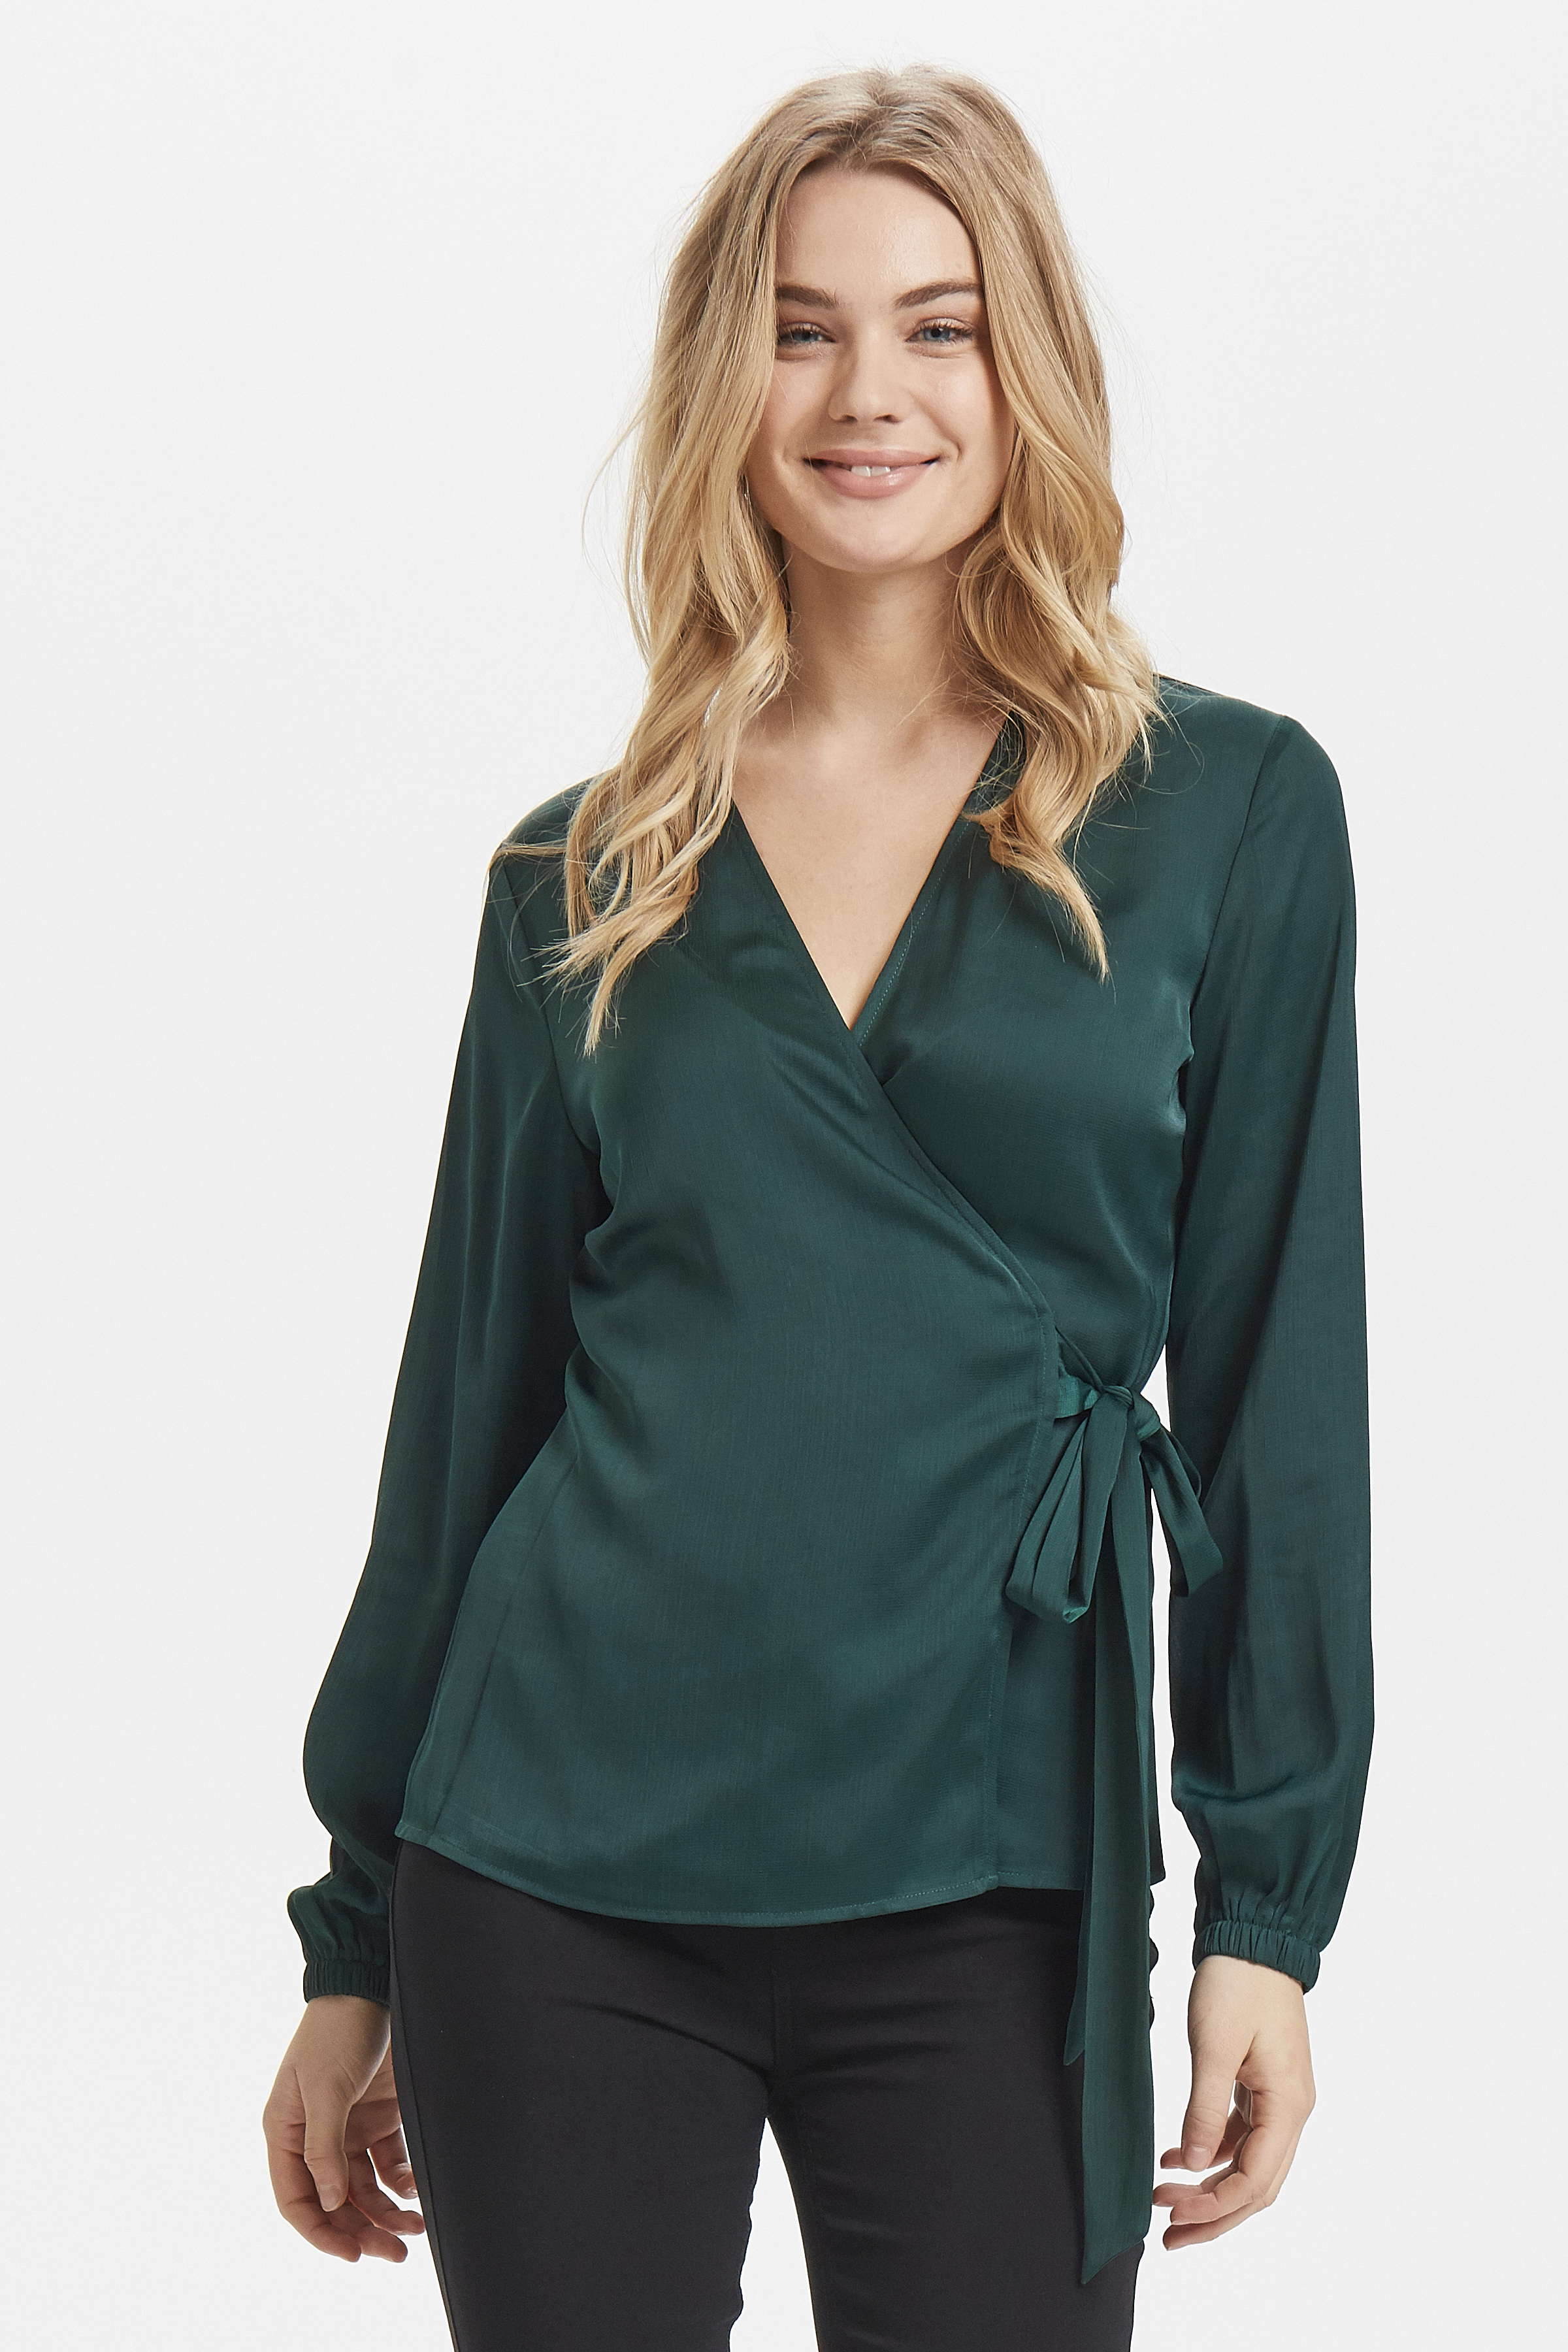 Majestic Green Langarm-Bluse von b.young – Kaufen Sie Majestic Green Langarm-Bluse aus Größe 34-42 hier